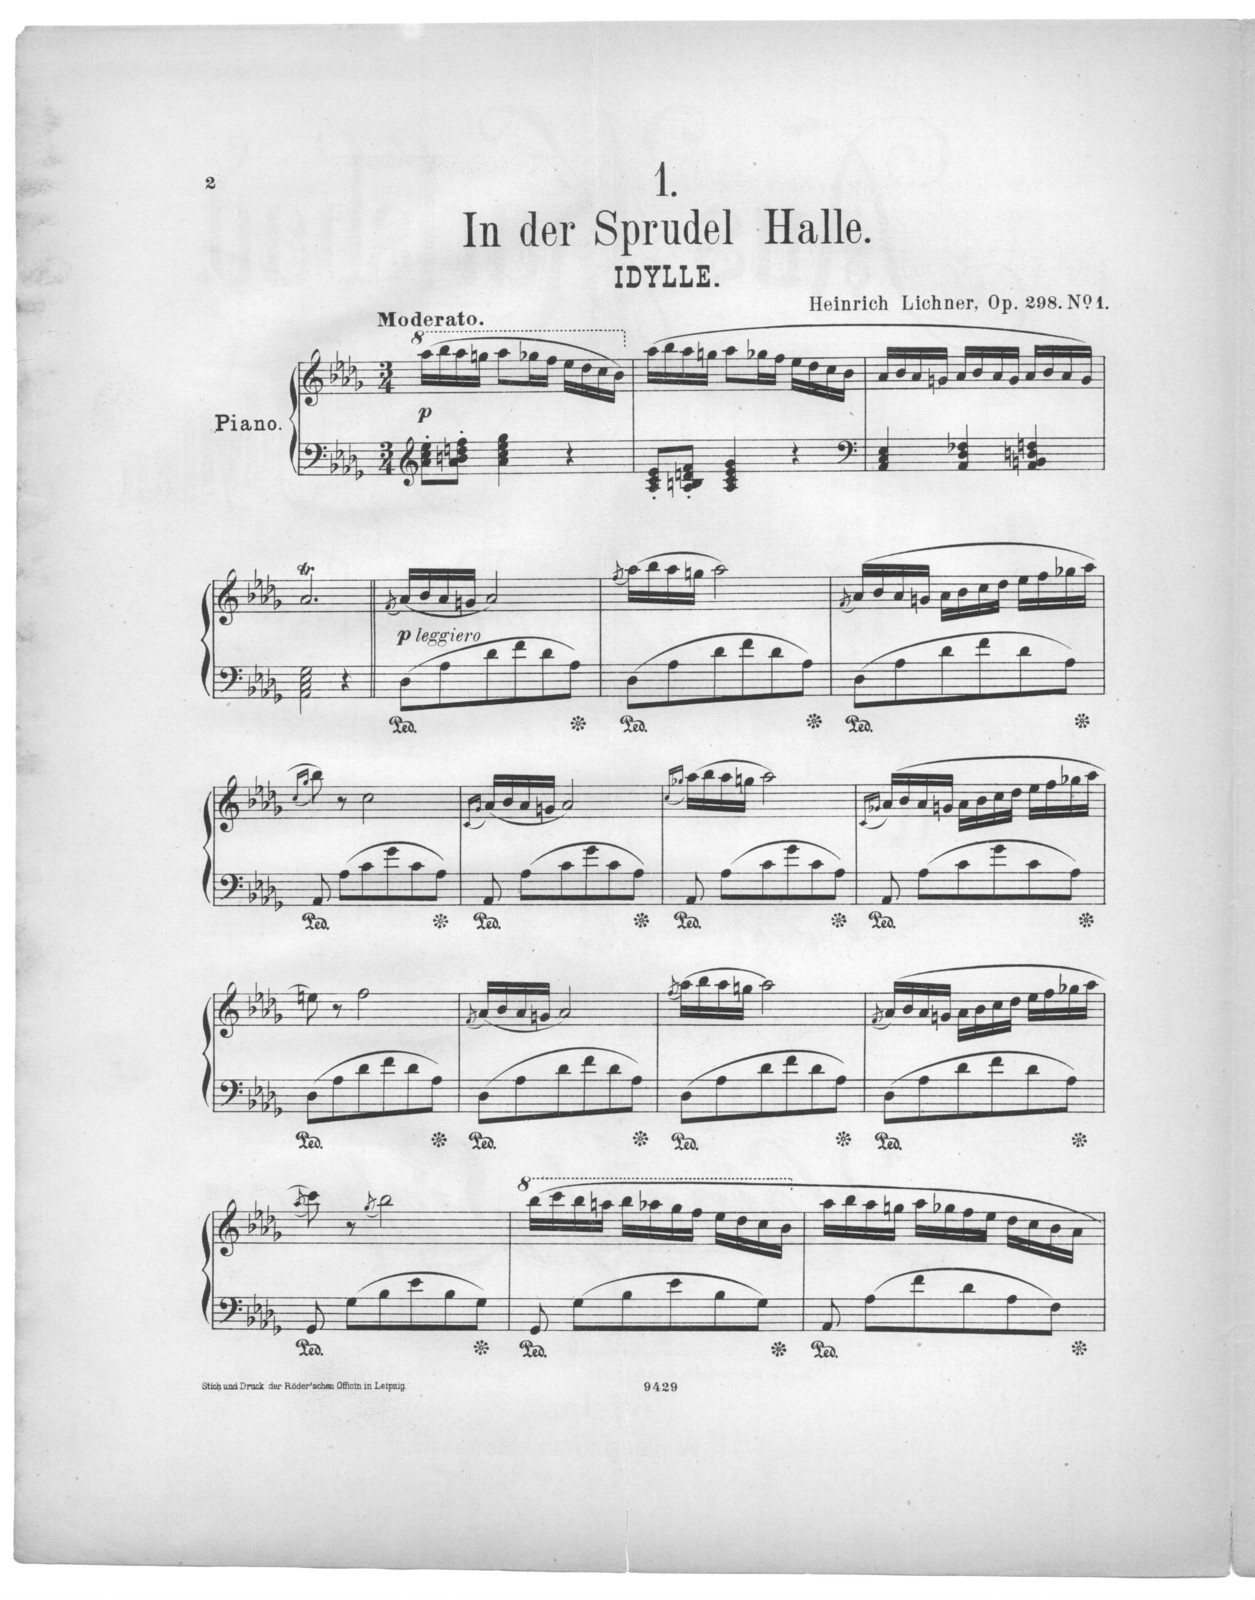 In der Sprudel Halle, op. 298, no. 1